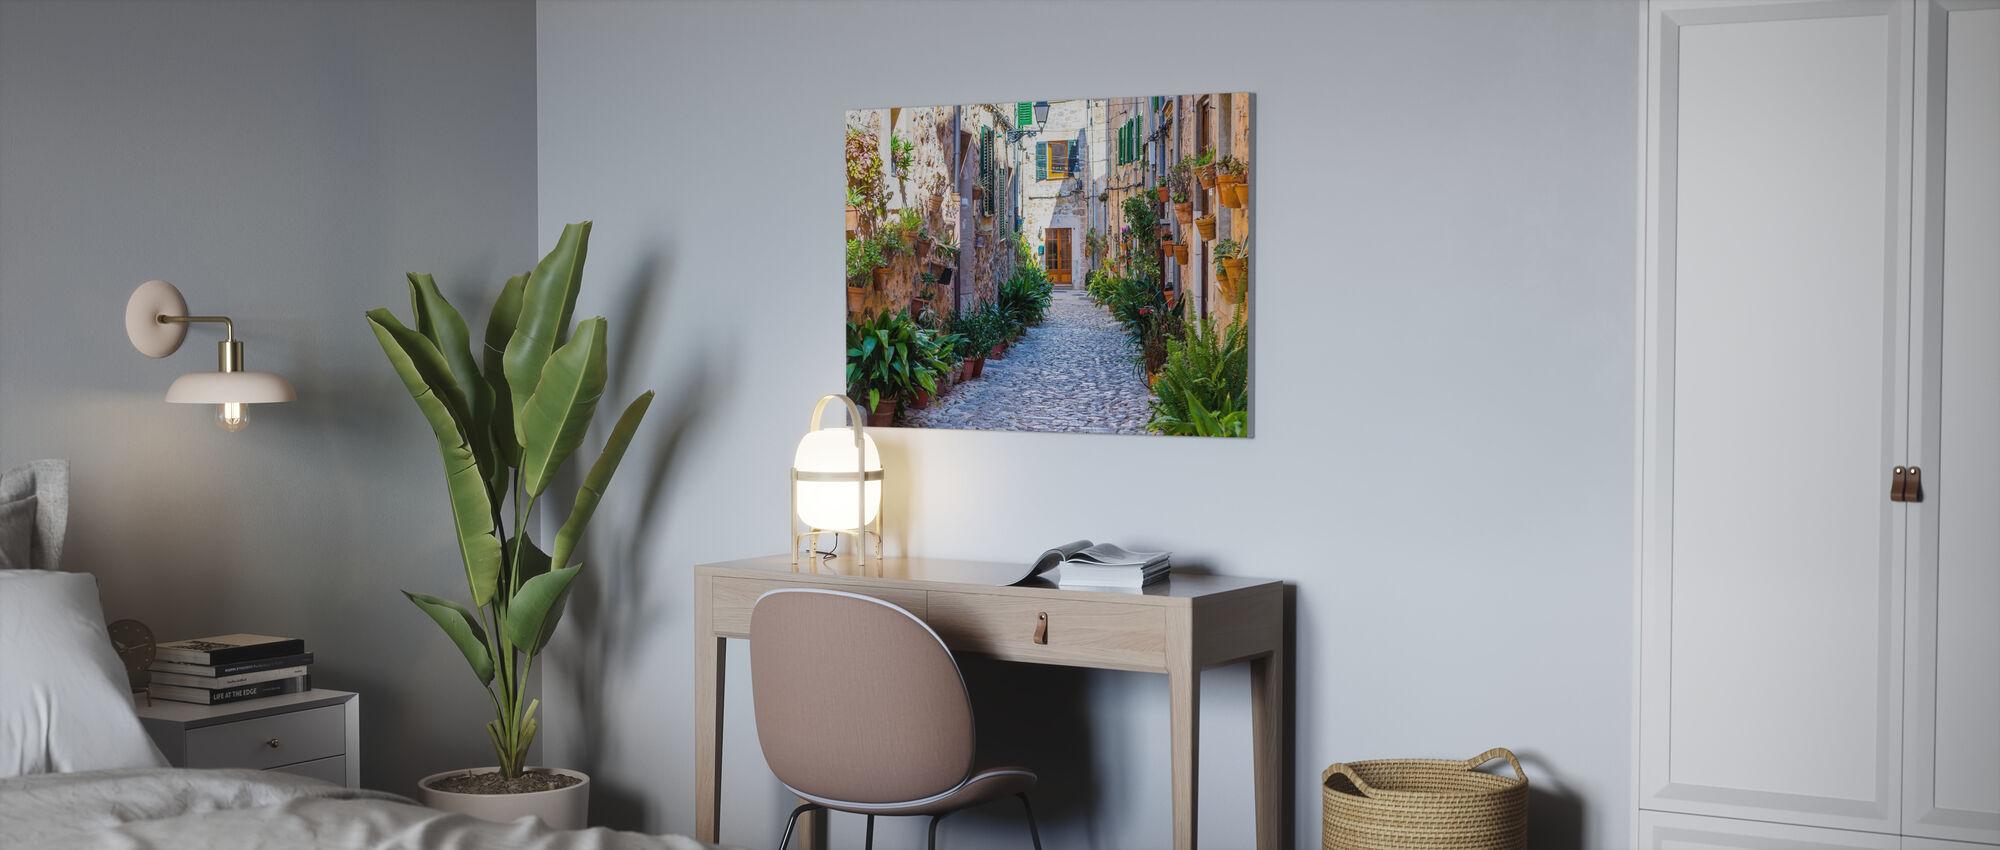 Plant Street - Canvas print - Office